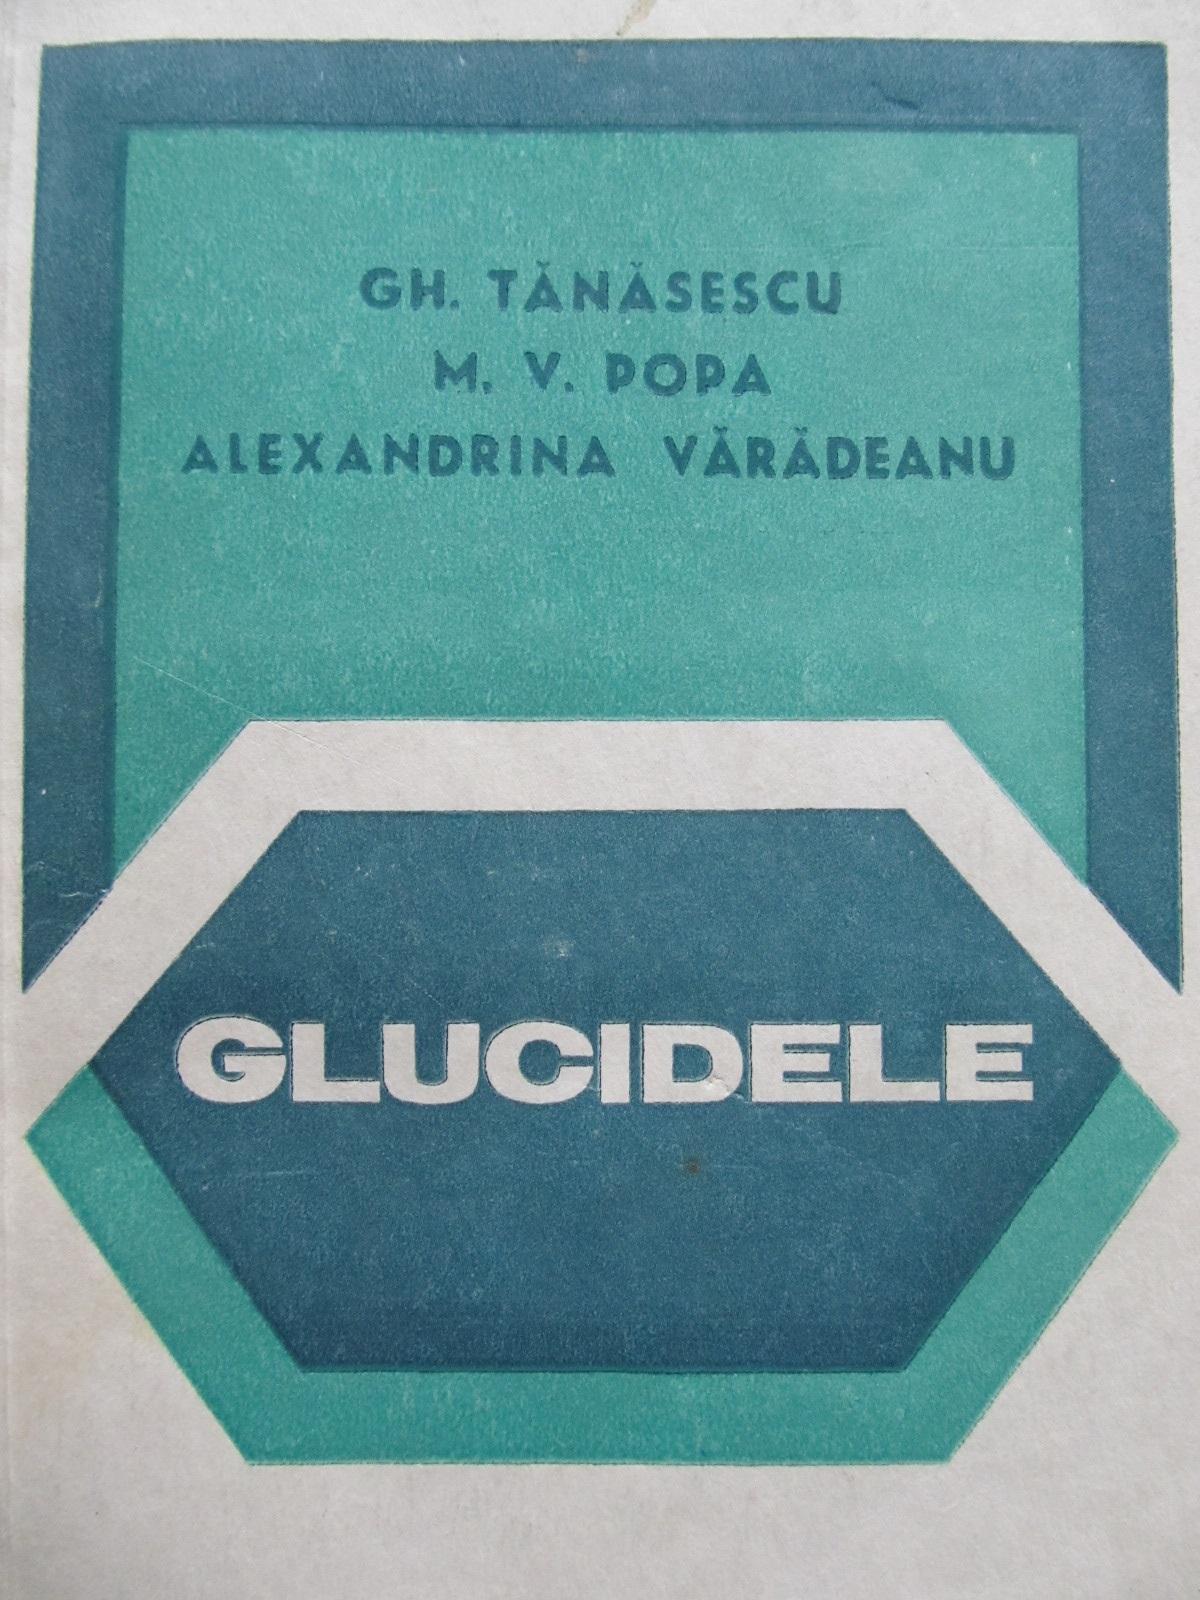 Glucidele - Gh. Tanasescu , ... | Detalii carte